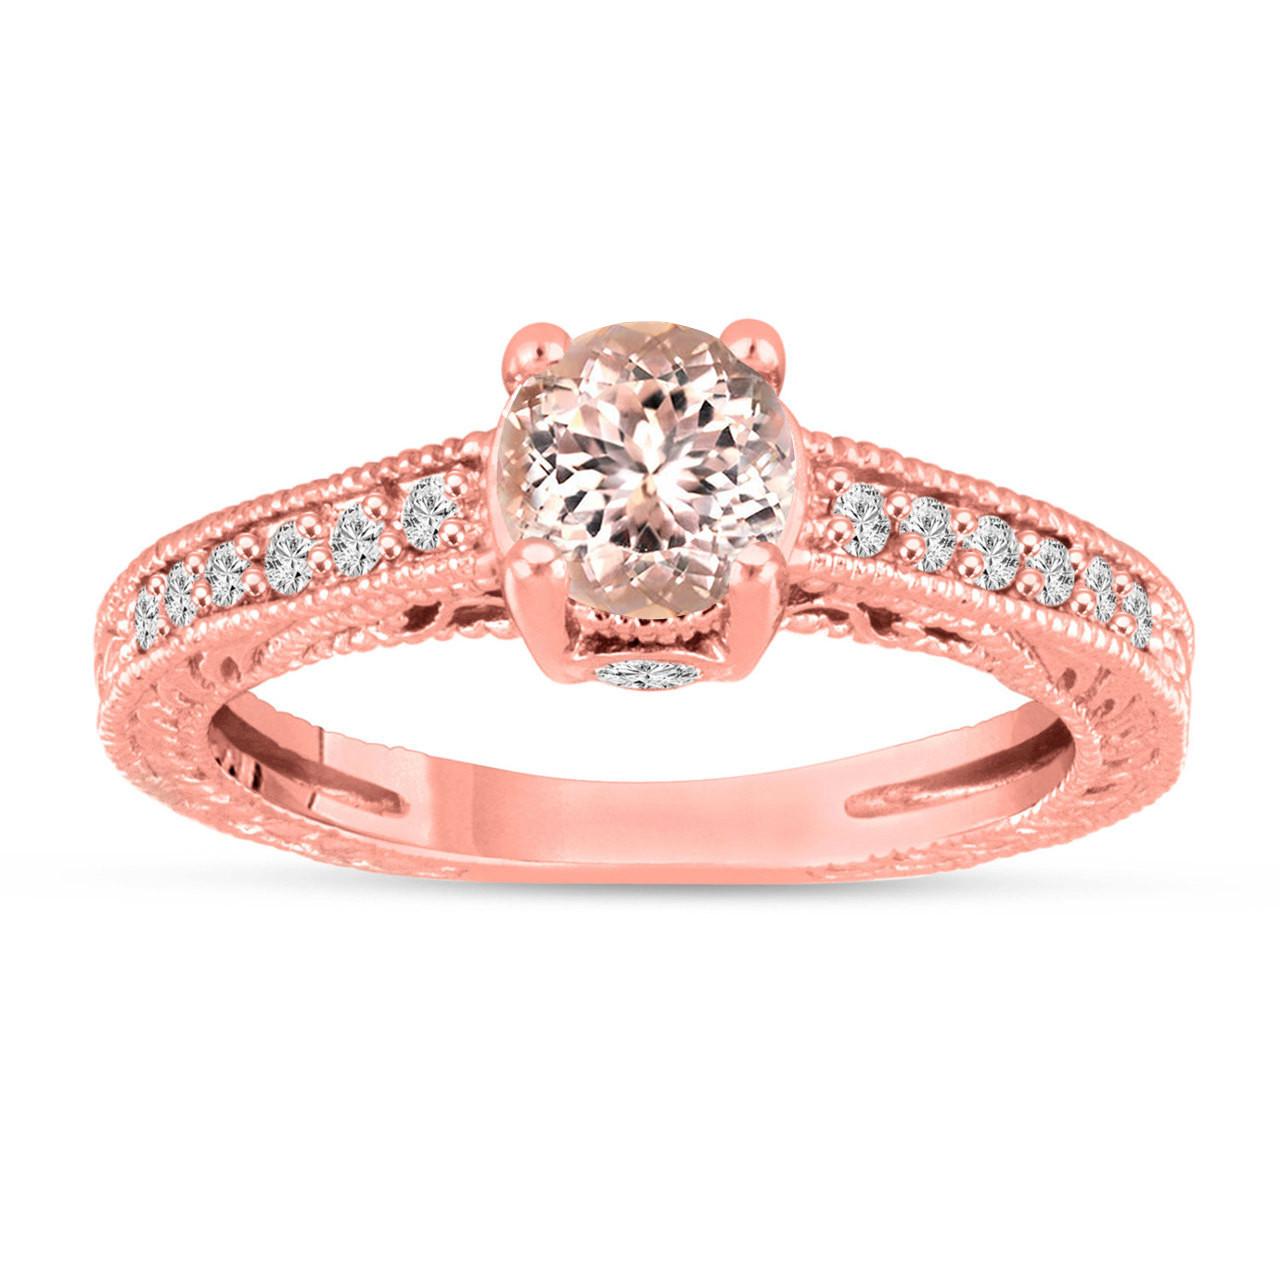 Pink Peach Morganite Engagement Ring 14K Rose Gold Vintage Antique ...